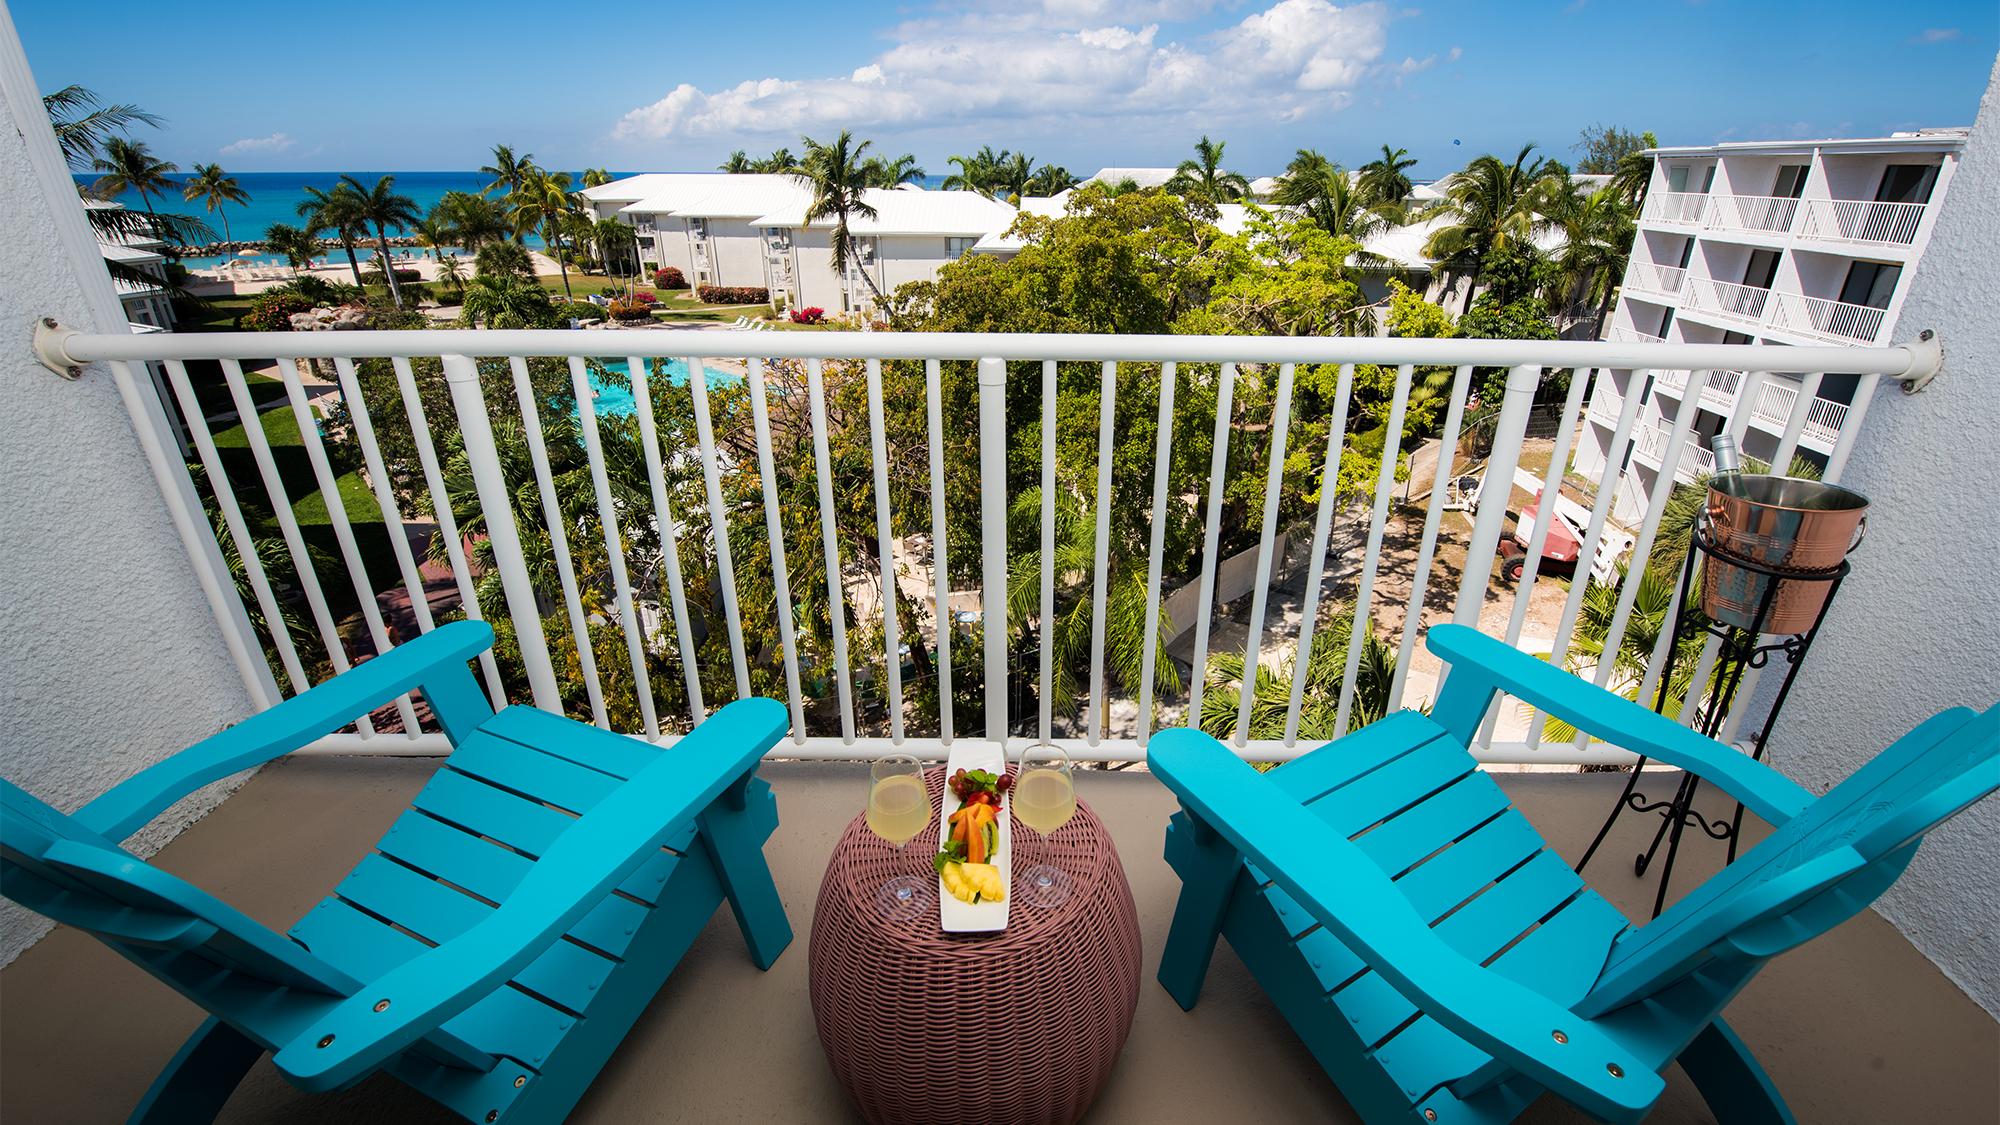 Margaritaville resort on Grand Cayman partially opens